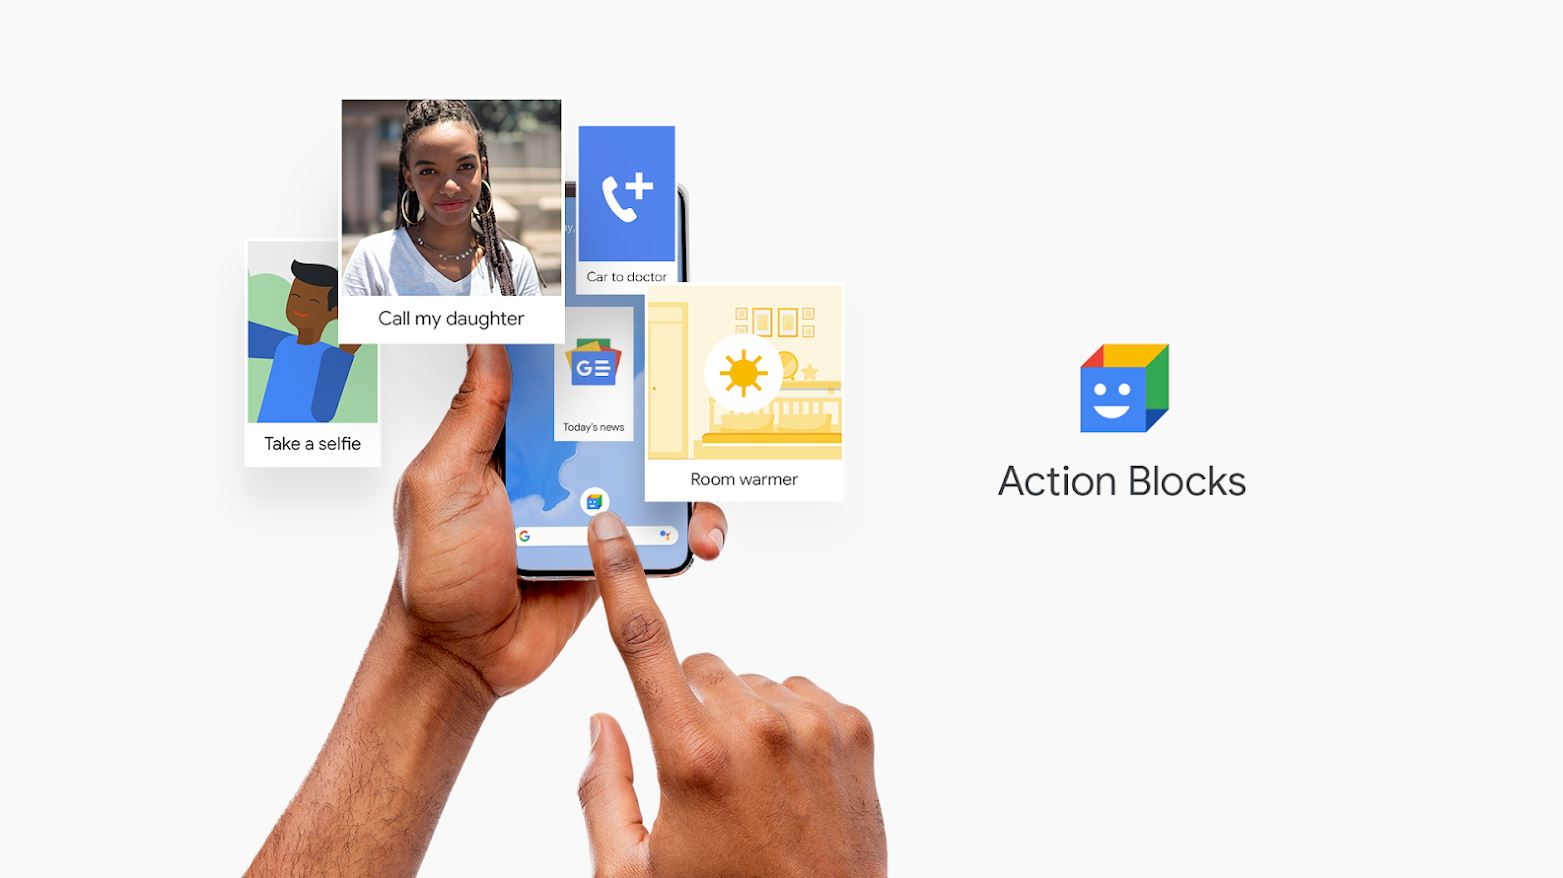 Action Blocks Google Assistant